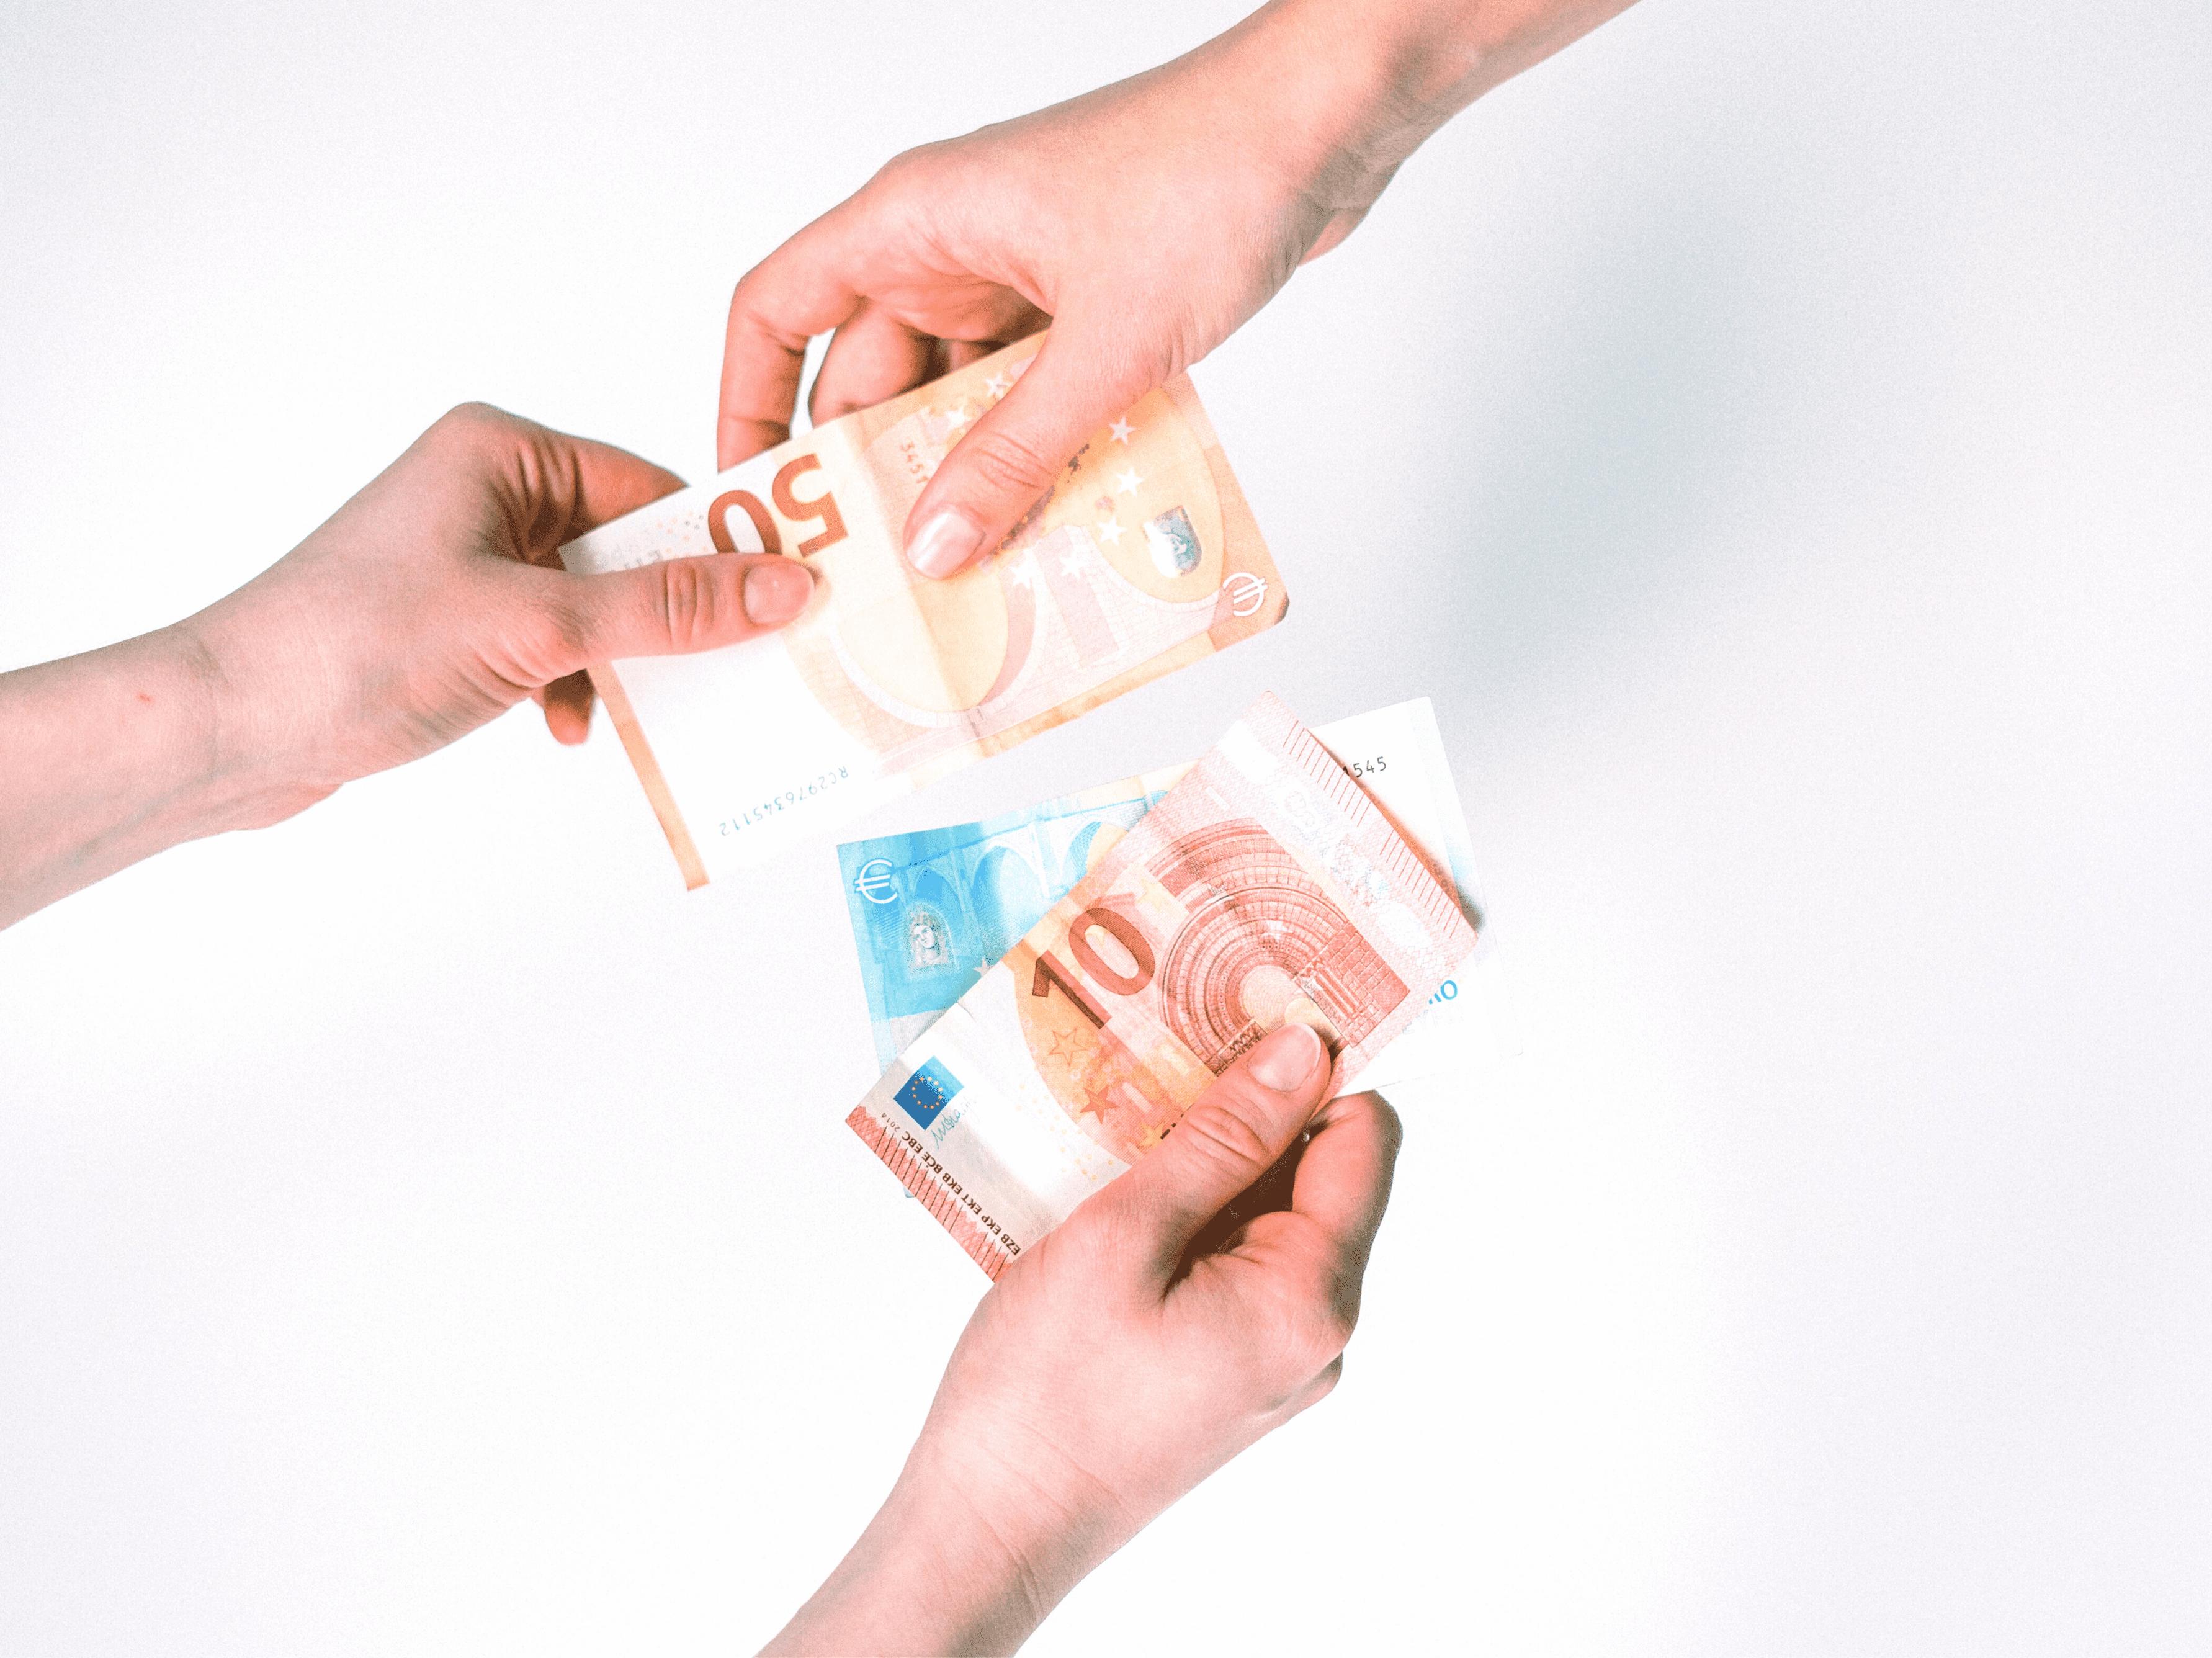 échange de billets en euros